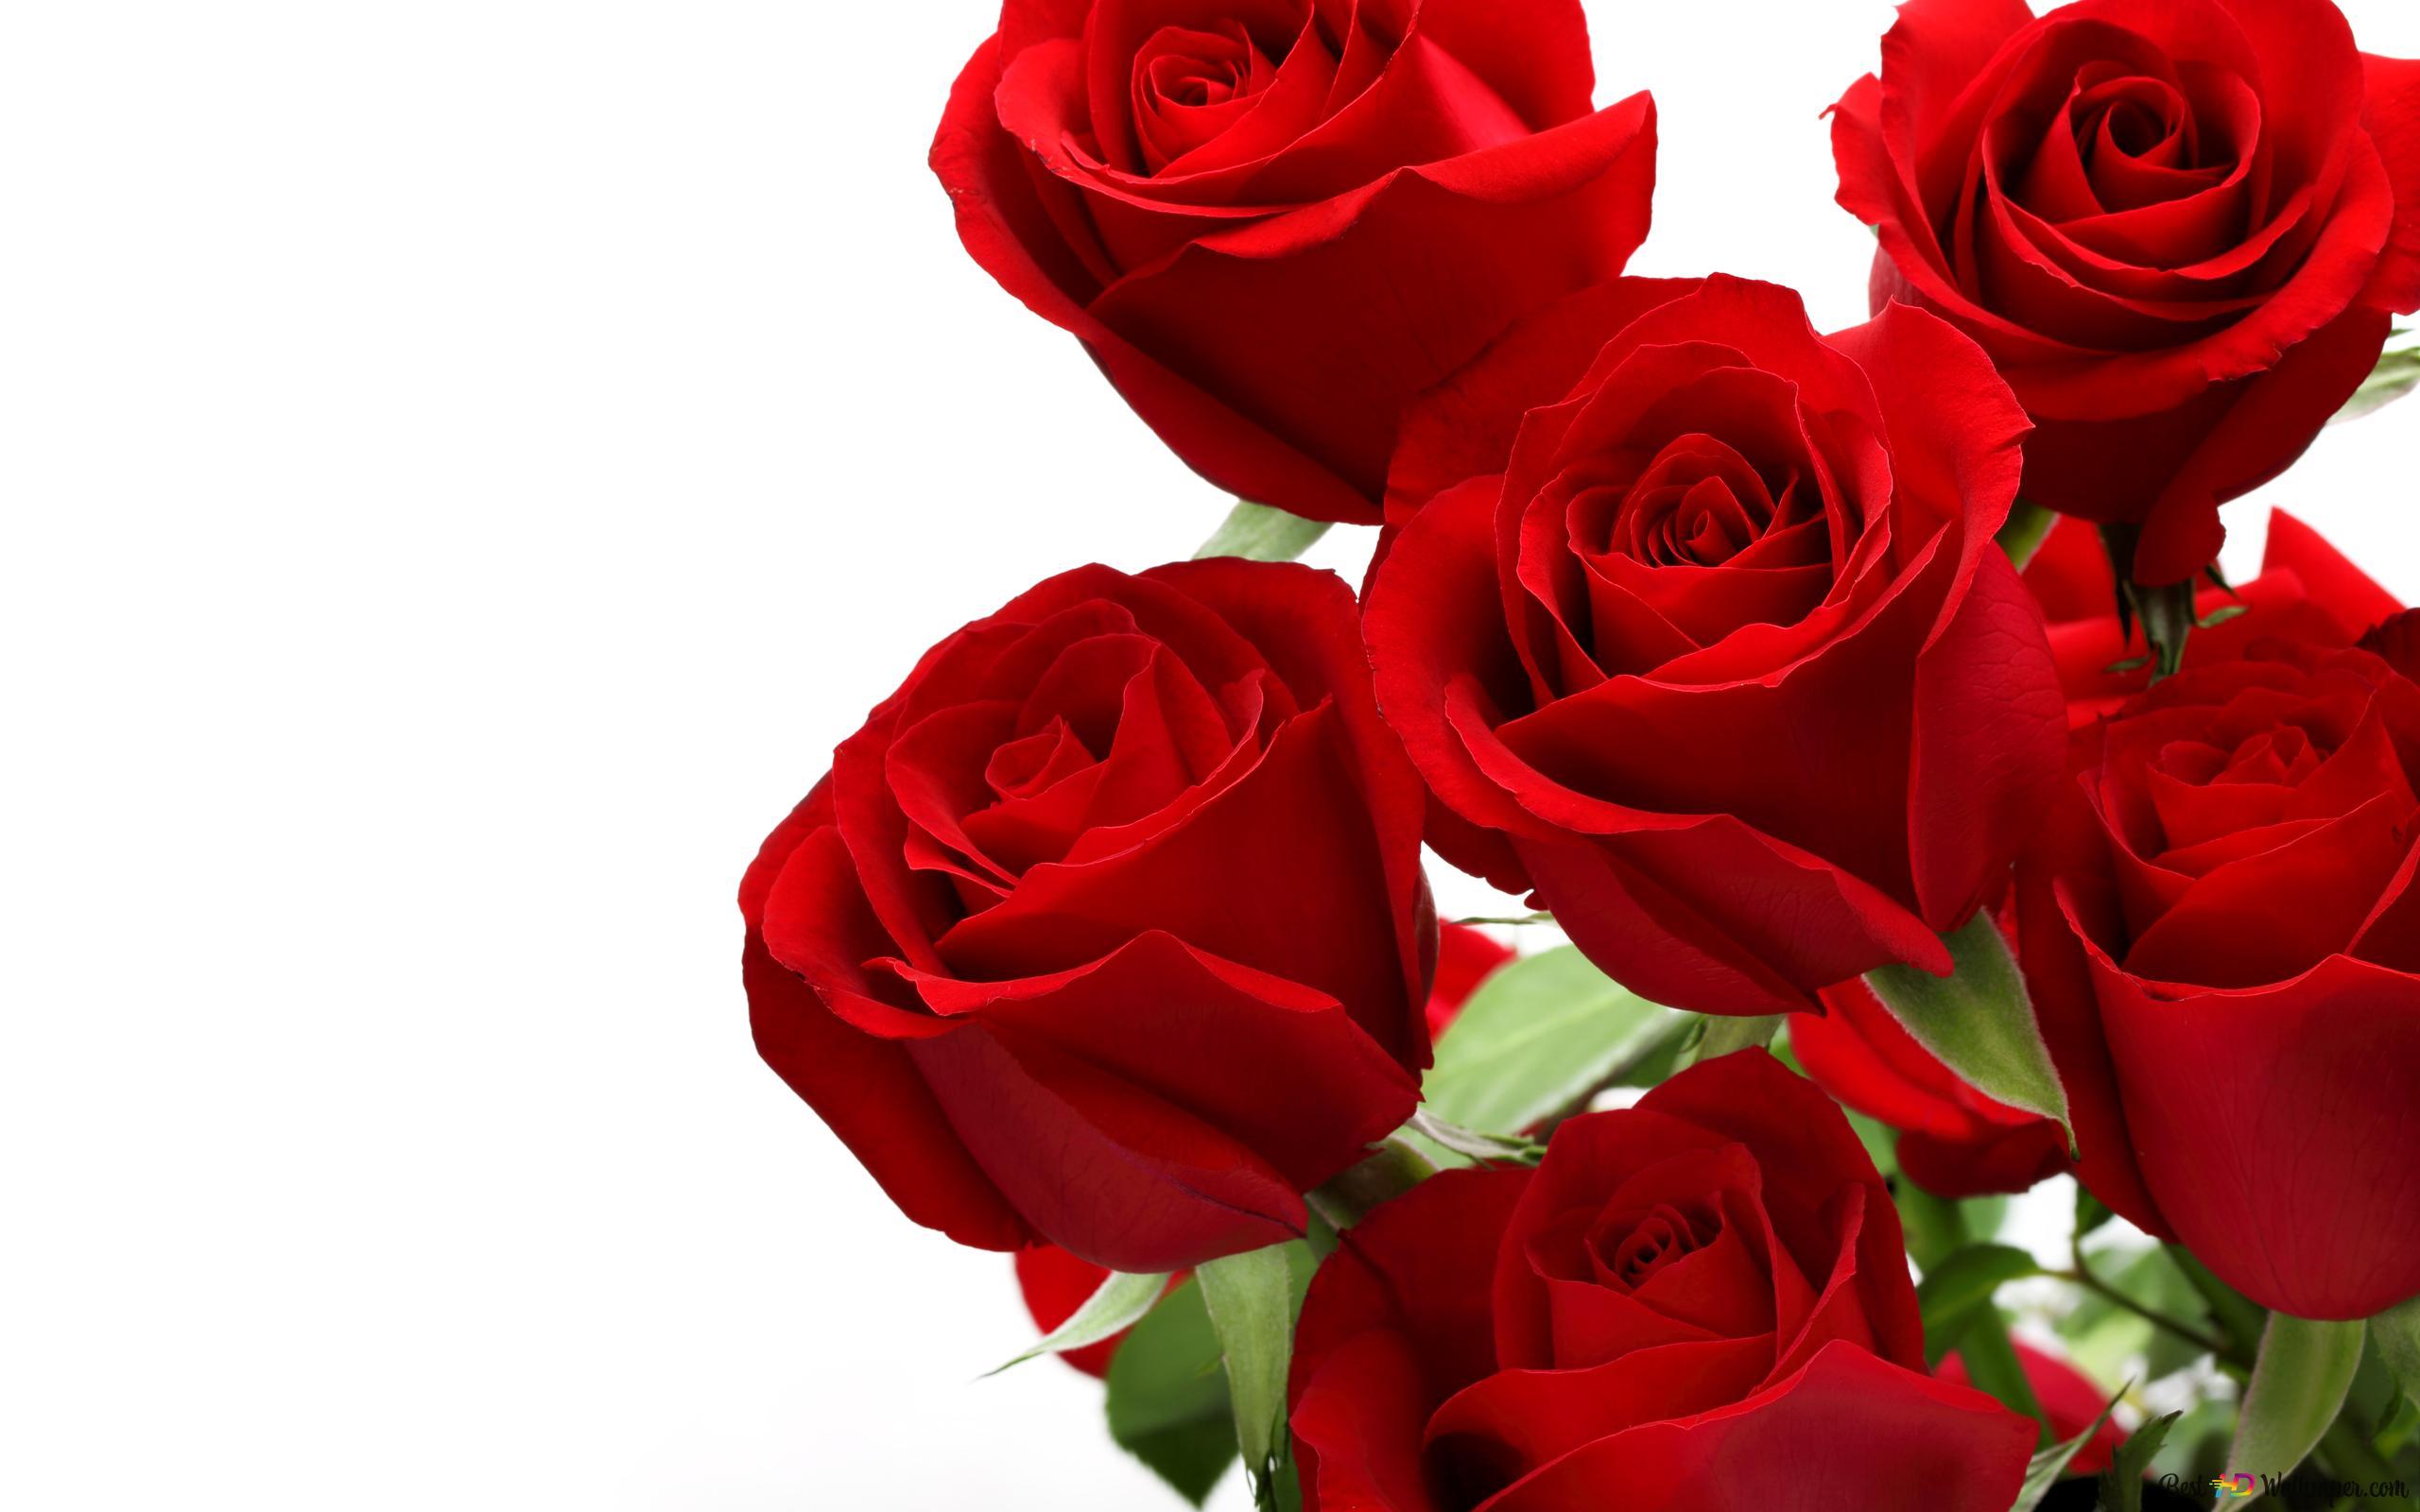 Red Rose Hd Wallpaper Download